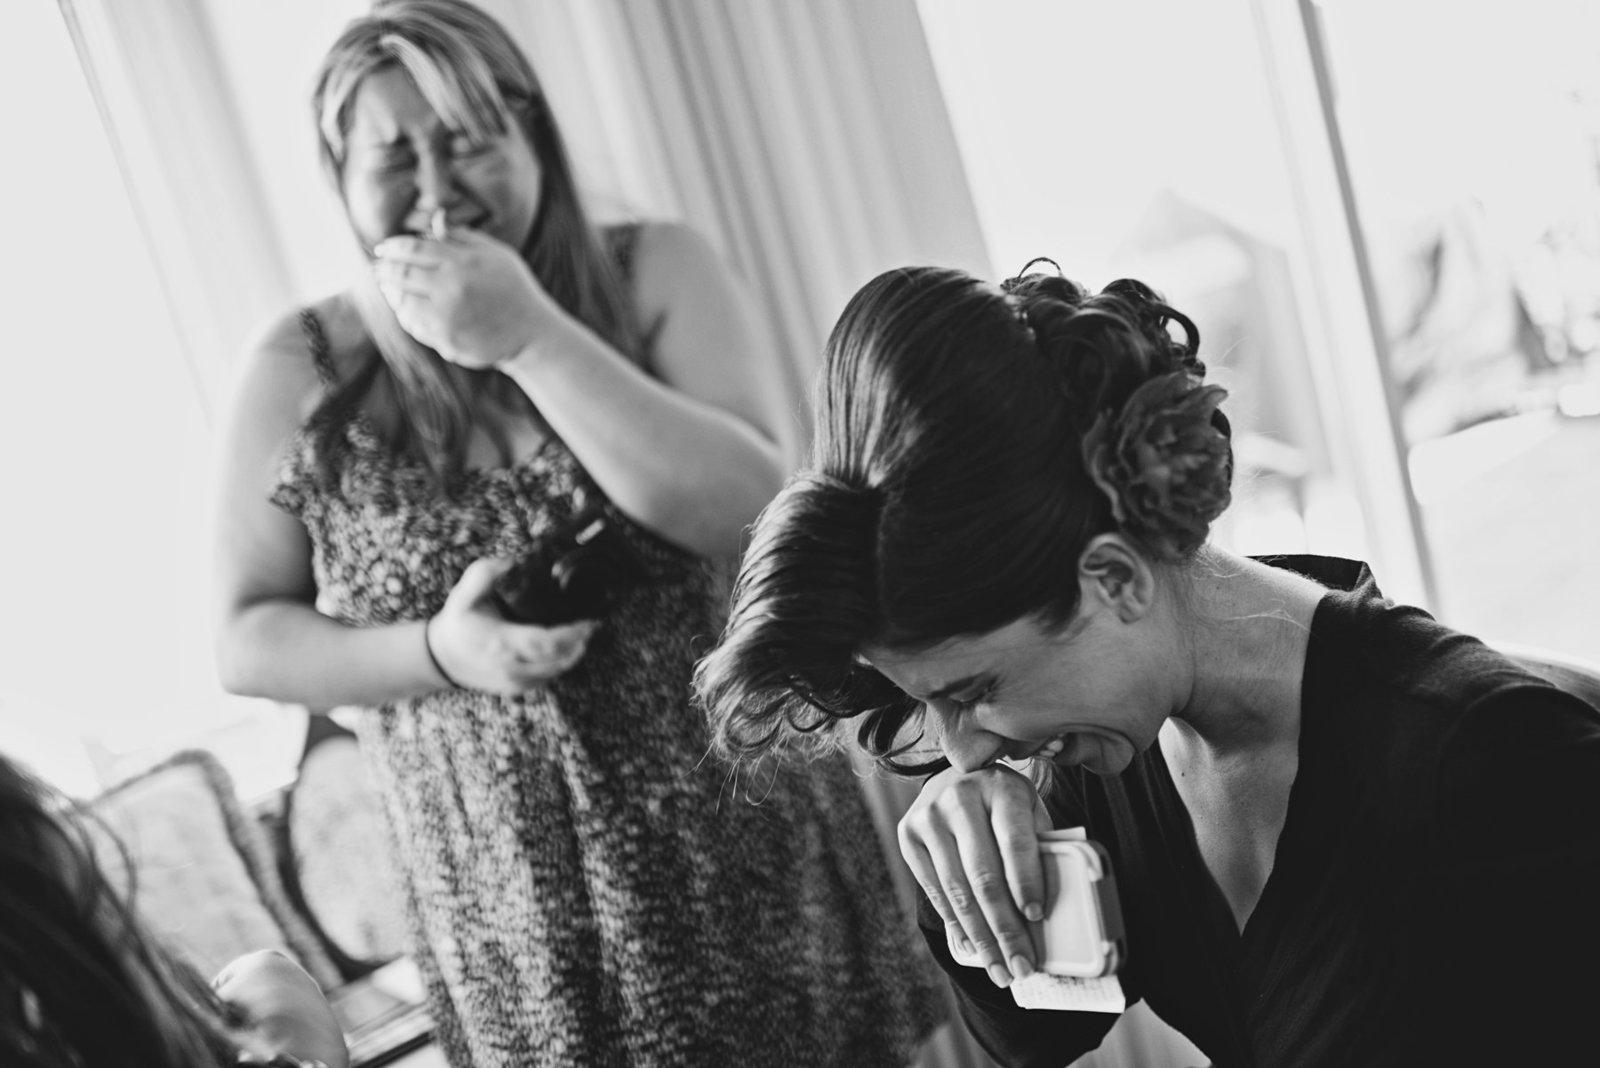 malibu wedding photographer photos celebrity wedding photographer bryan newfield photography ruth mike 02